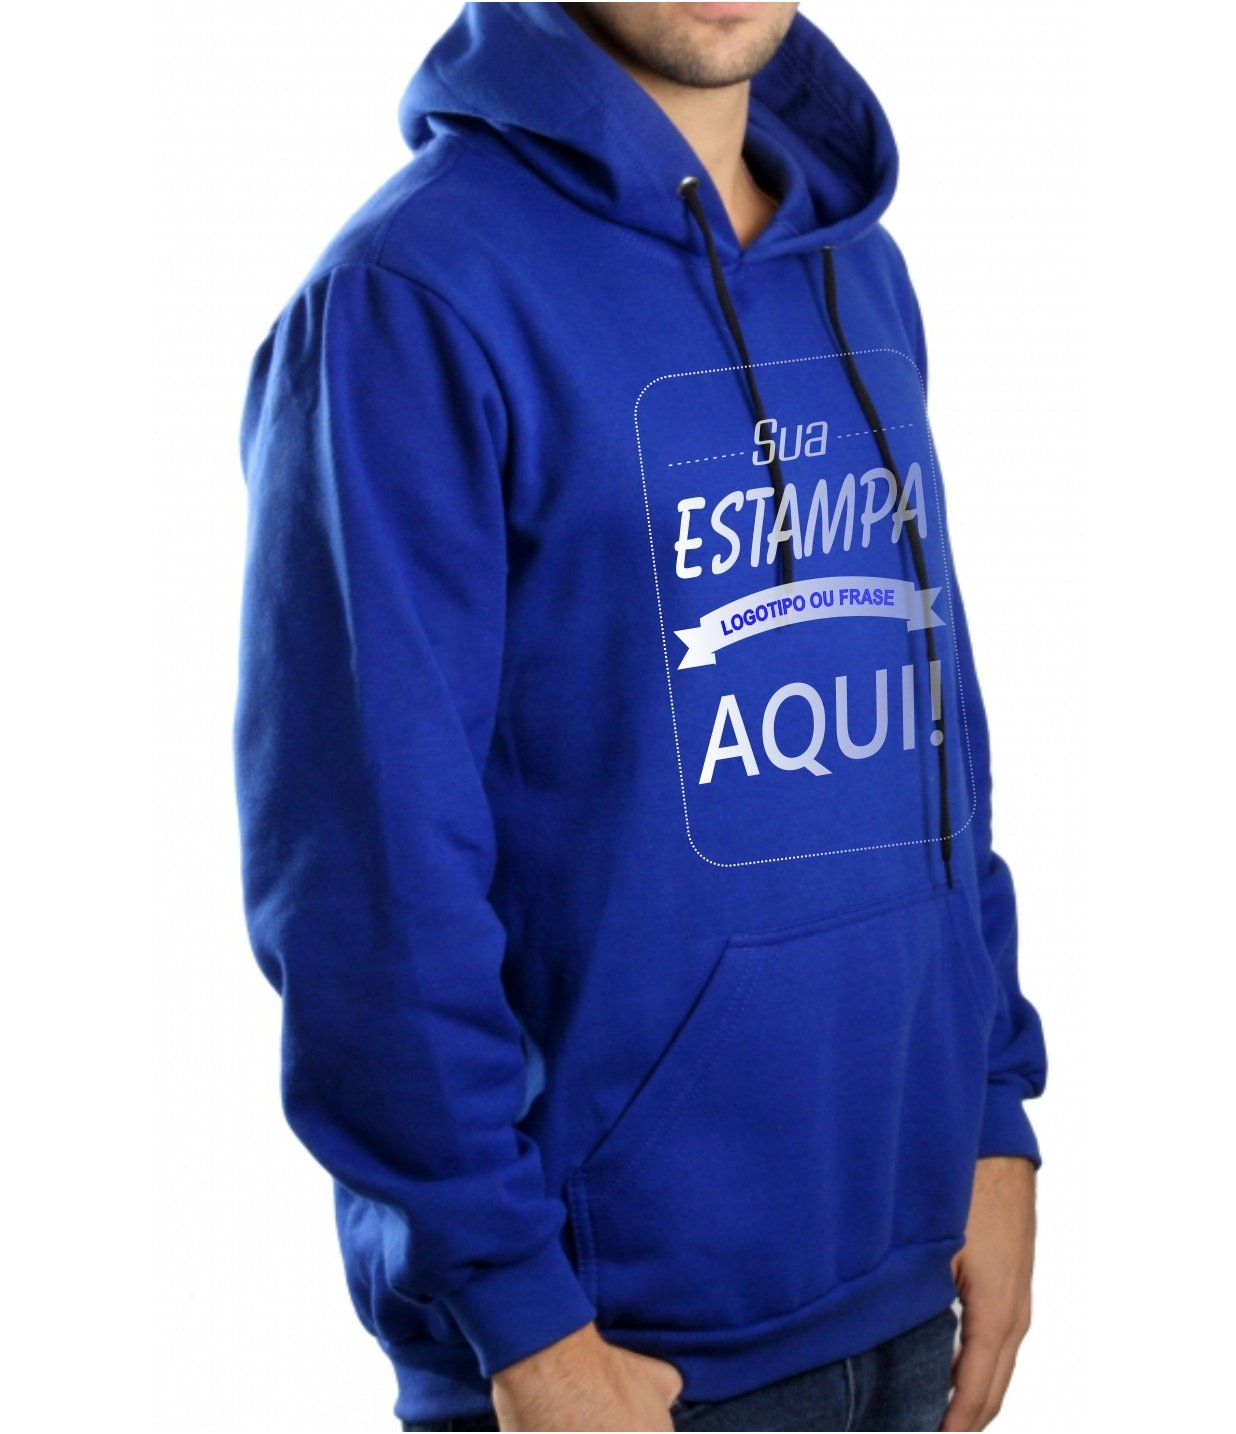 Blusa Moletom Masculina Canguru Personalizada Azul Royal Estampa frente media (A4)